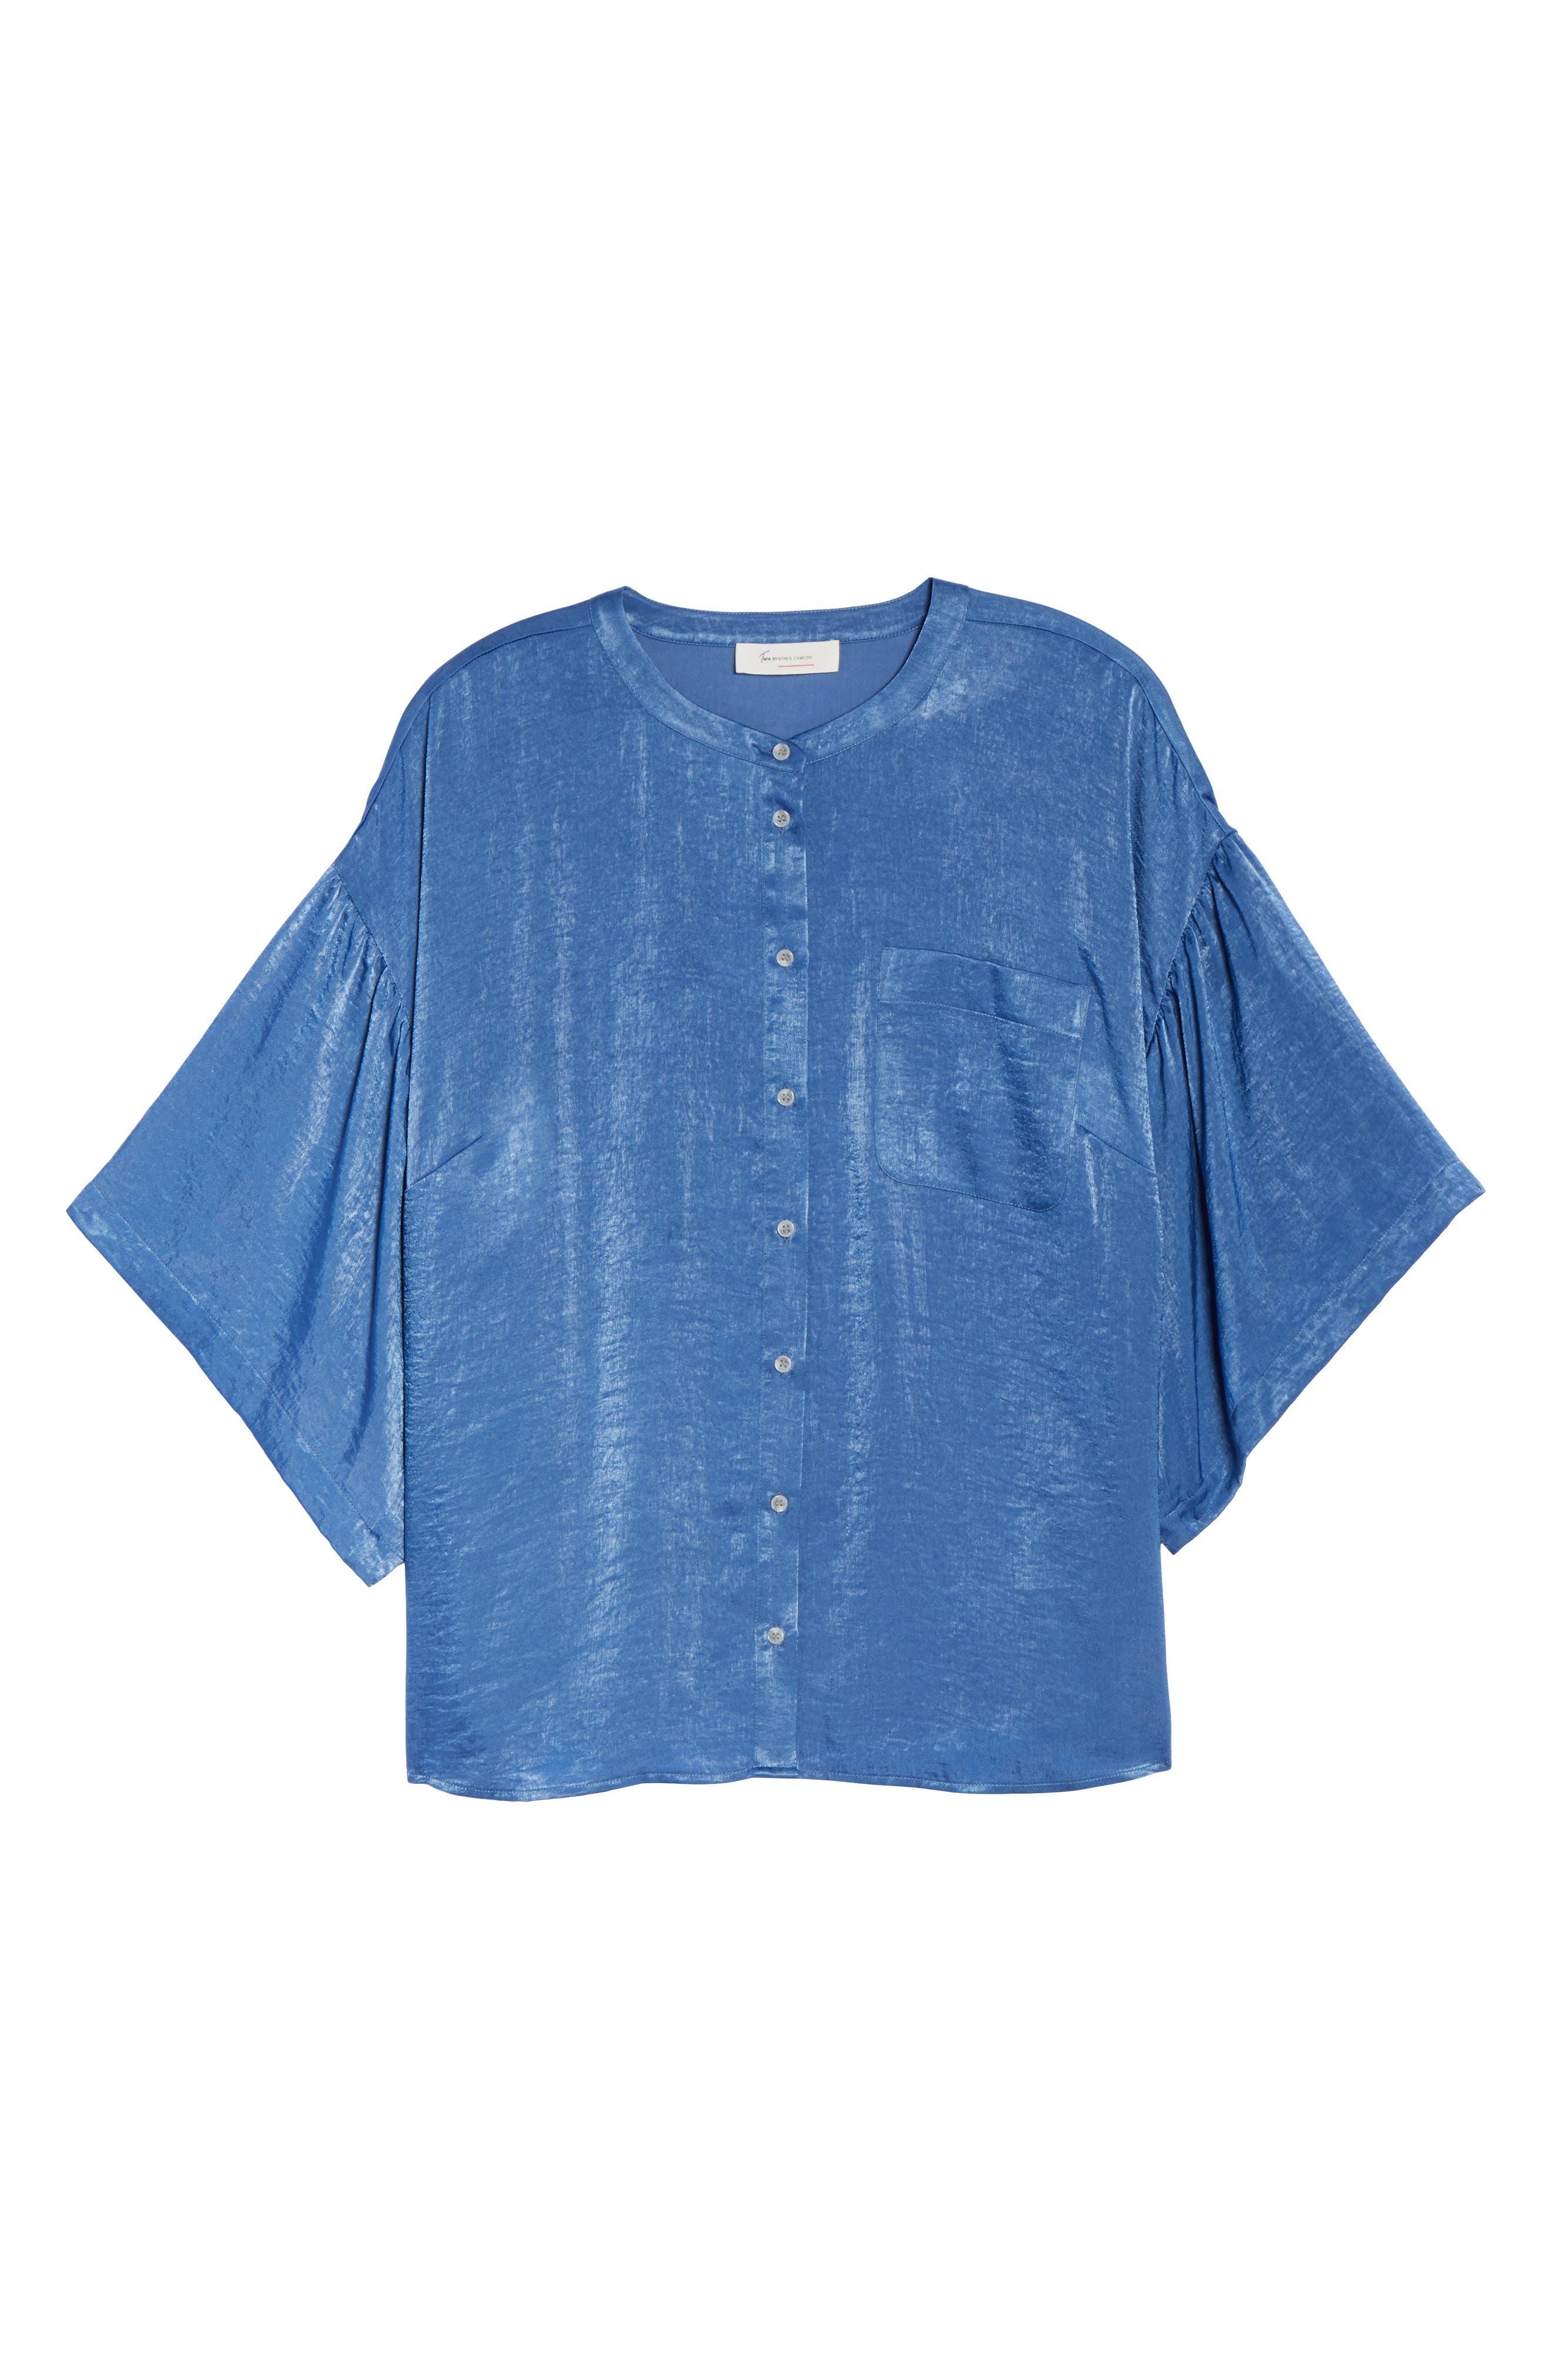 Bell Sleeve Rumpled Satin Blouse,                             Alternate thumbnail 6, color,                             322-Divine Blue